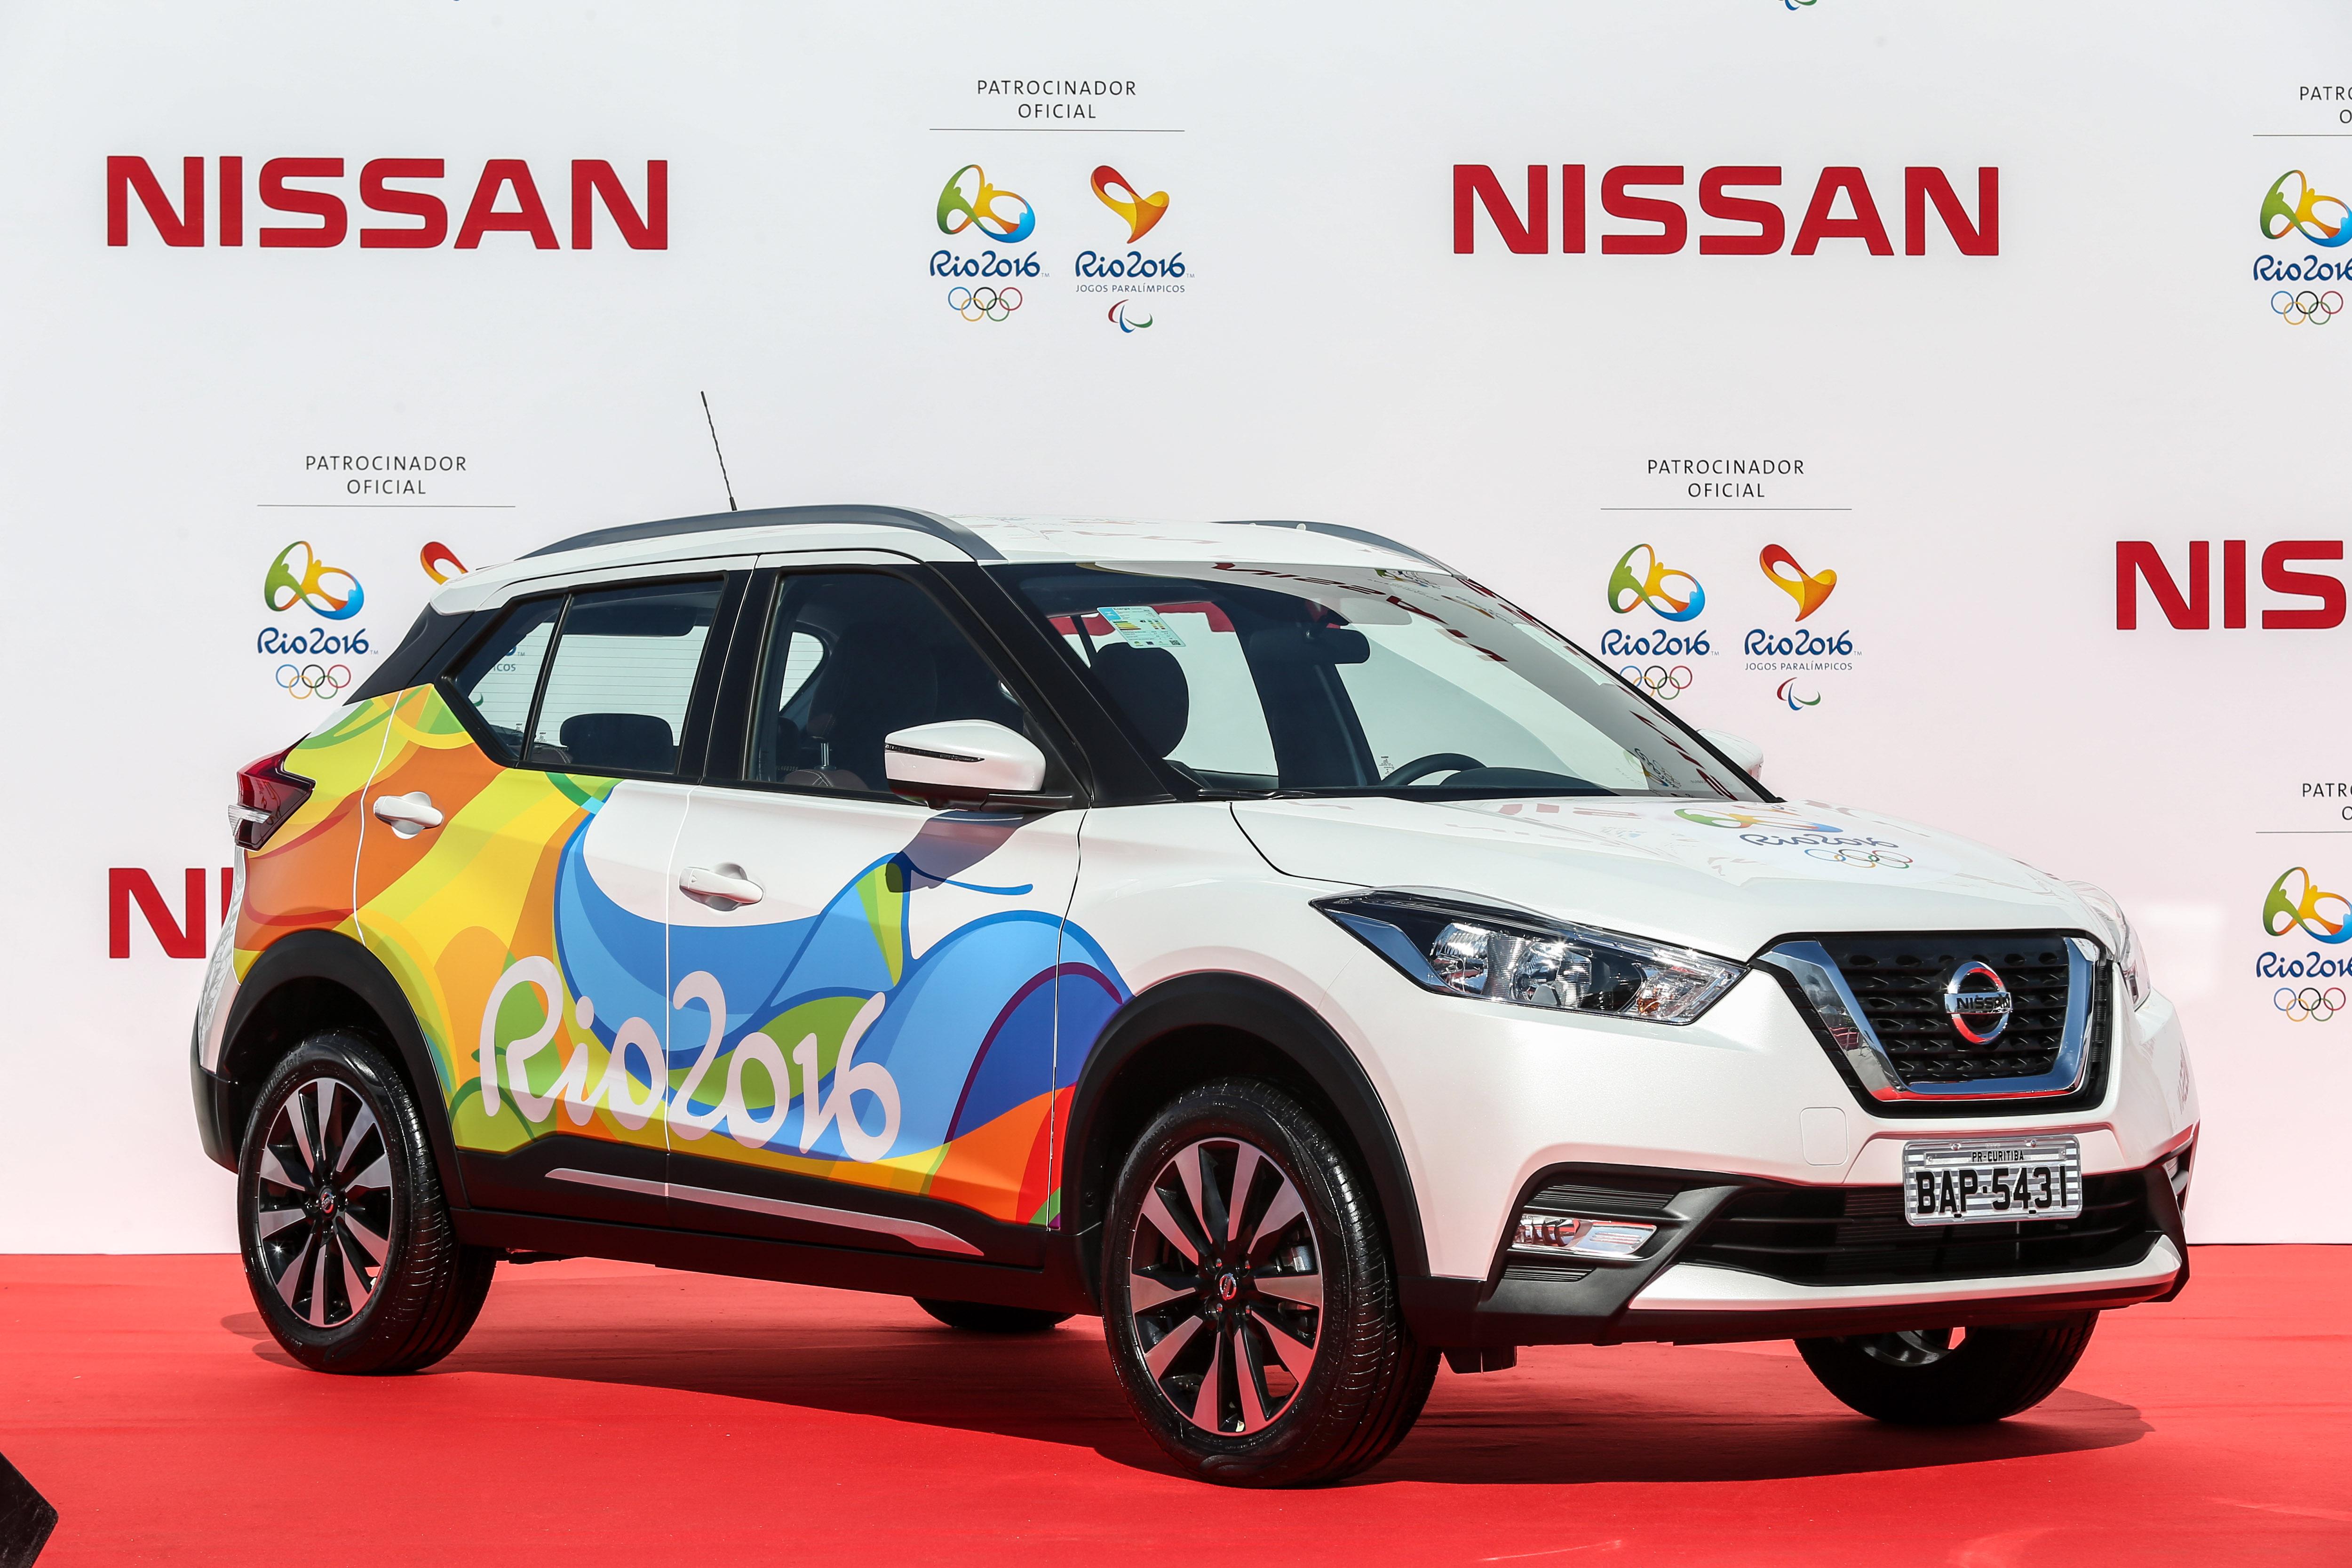 Nissan Olympics Rio